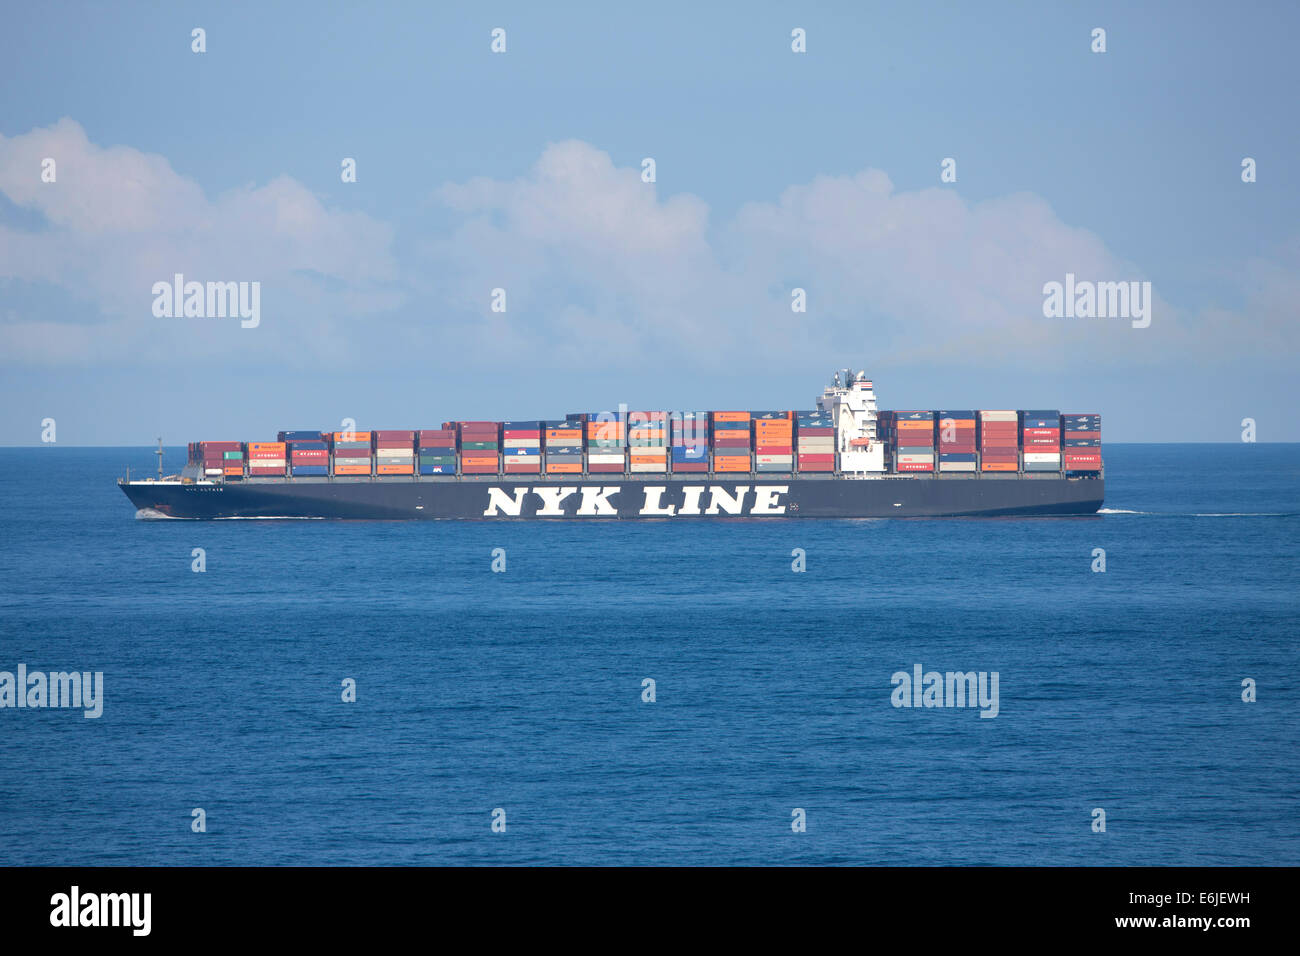 NYK Line Altair cargo container ship in Mediterranean sea - Stock Image